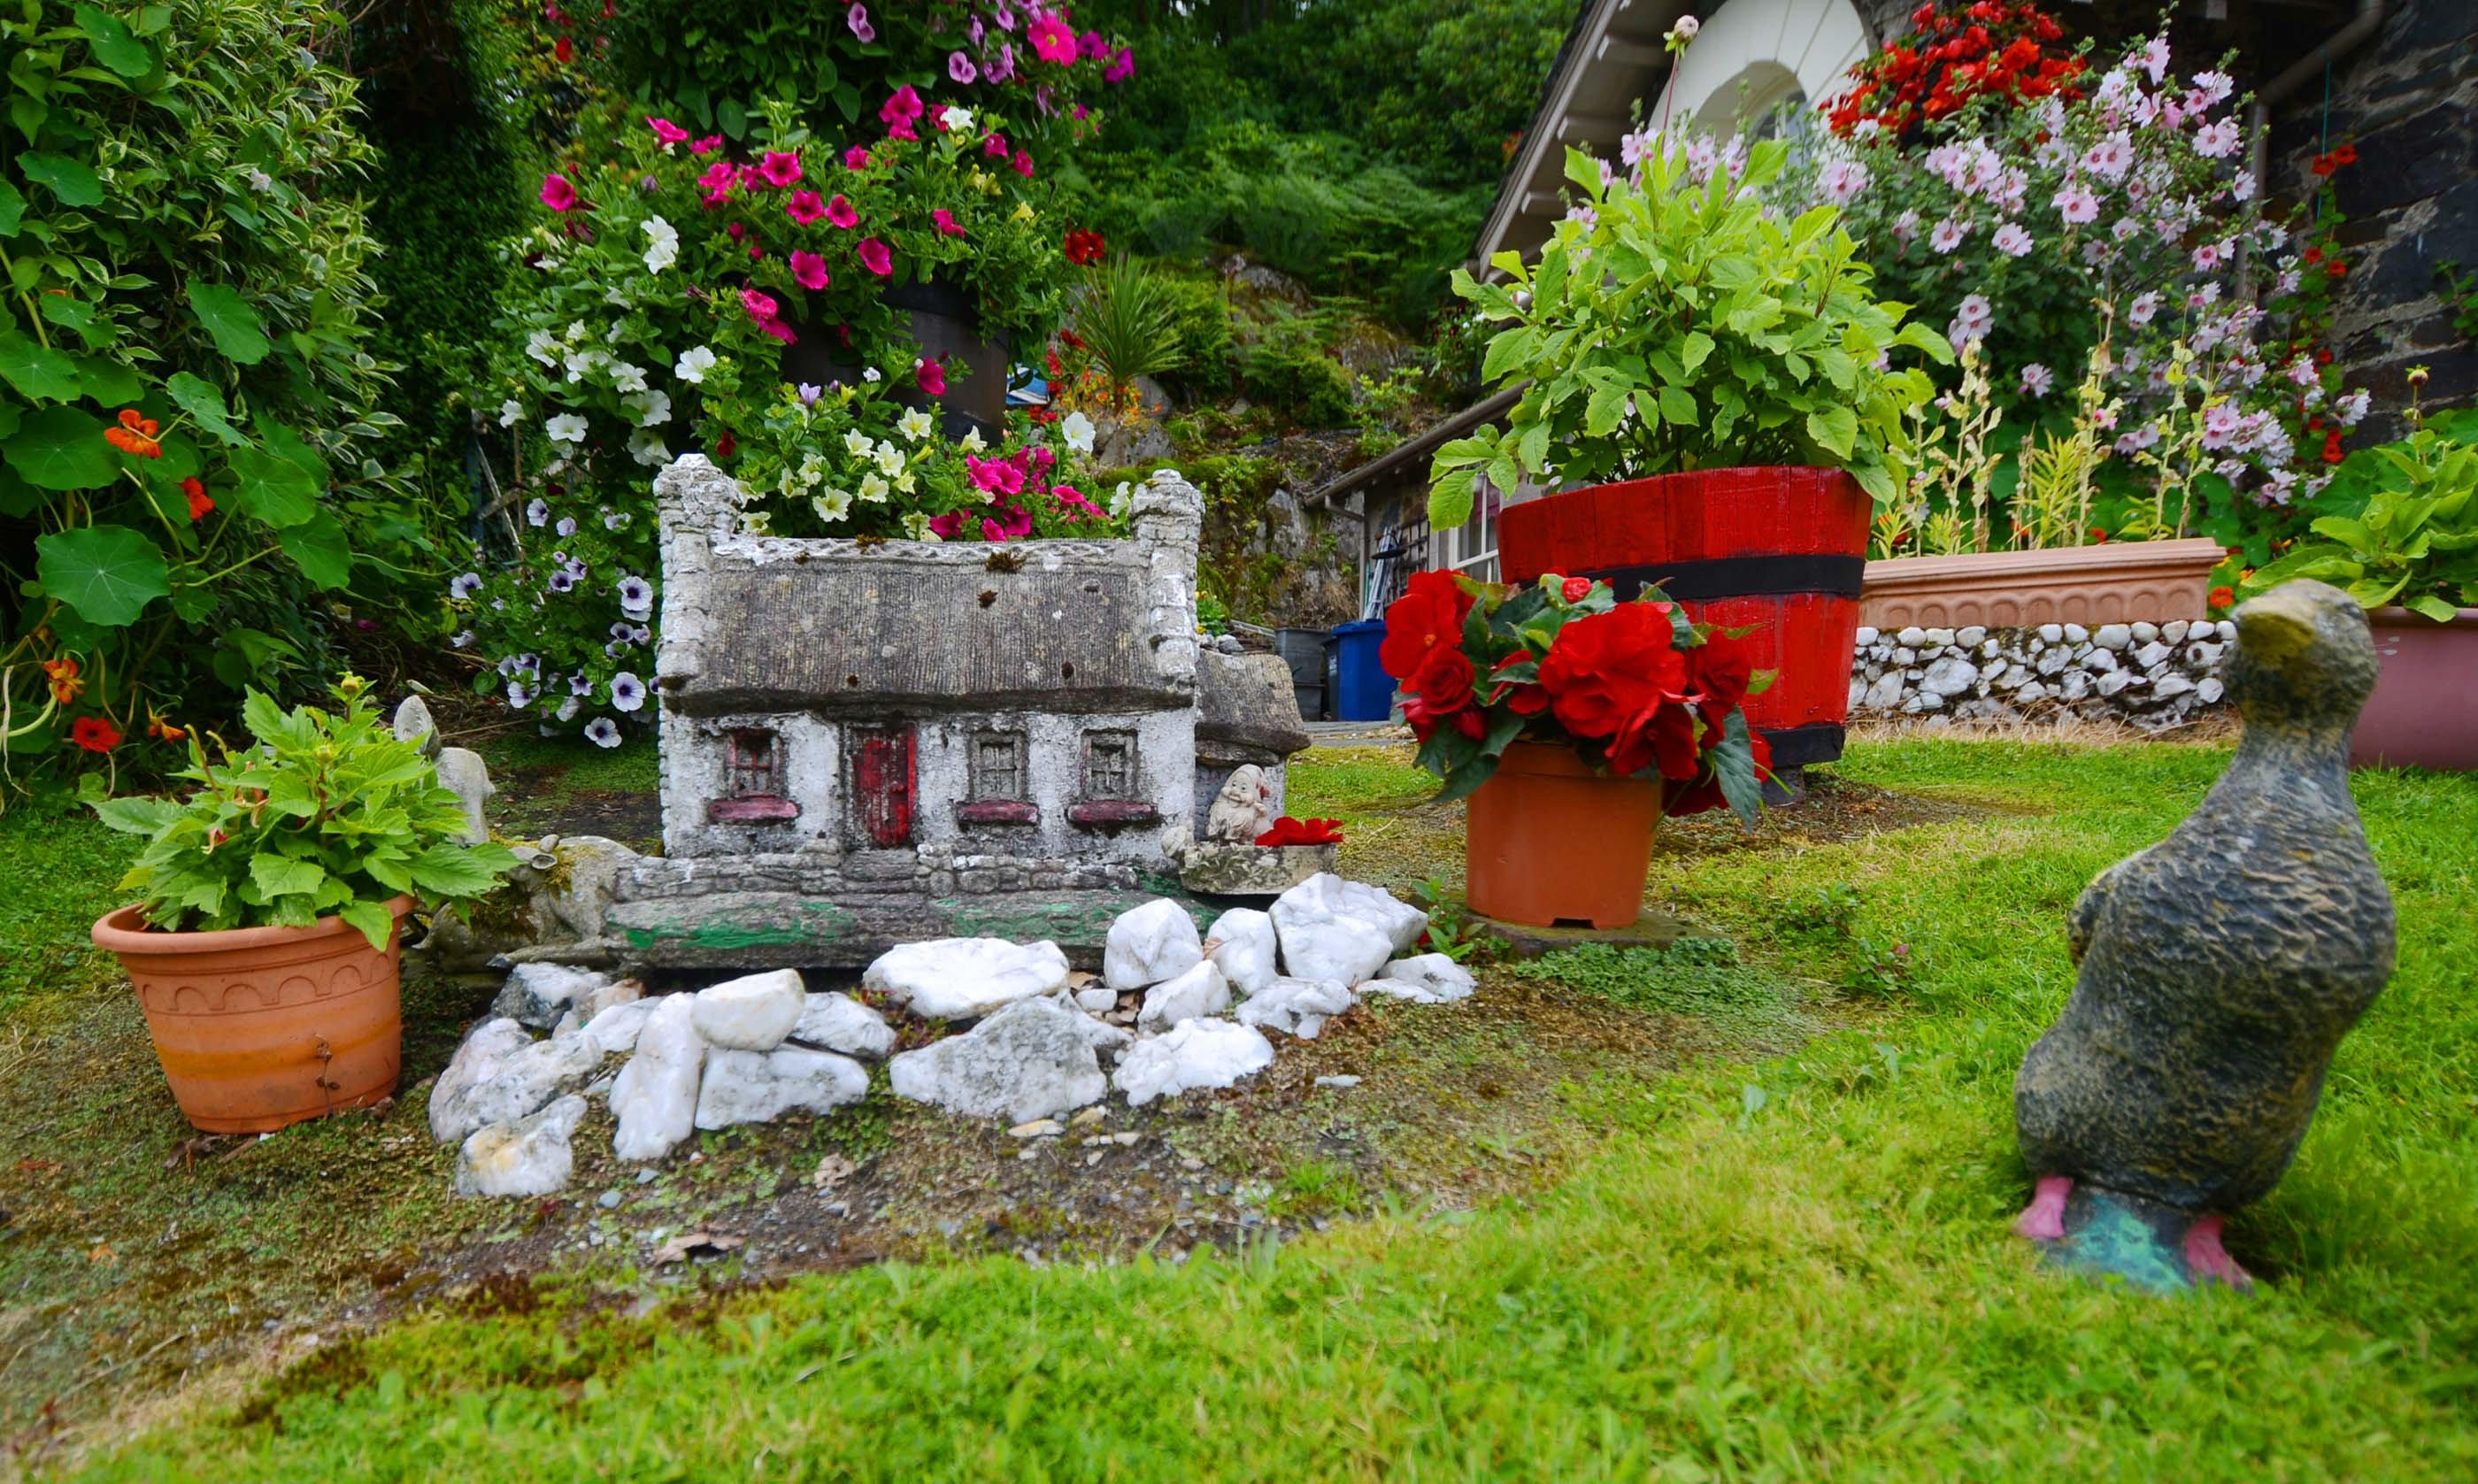 Rabbie Burns' stunning garden overlooking Loch Lomond, near the village of Luss